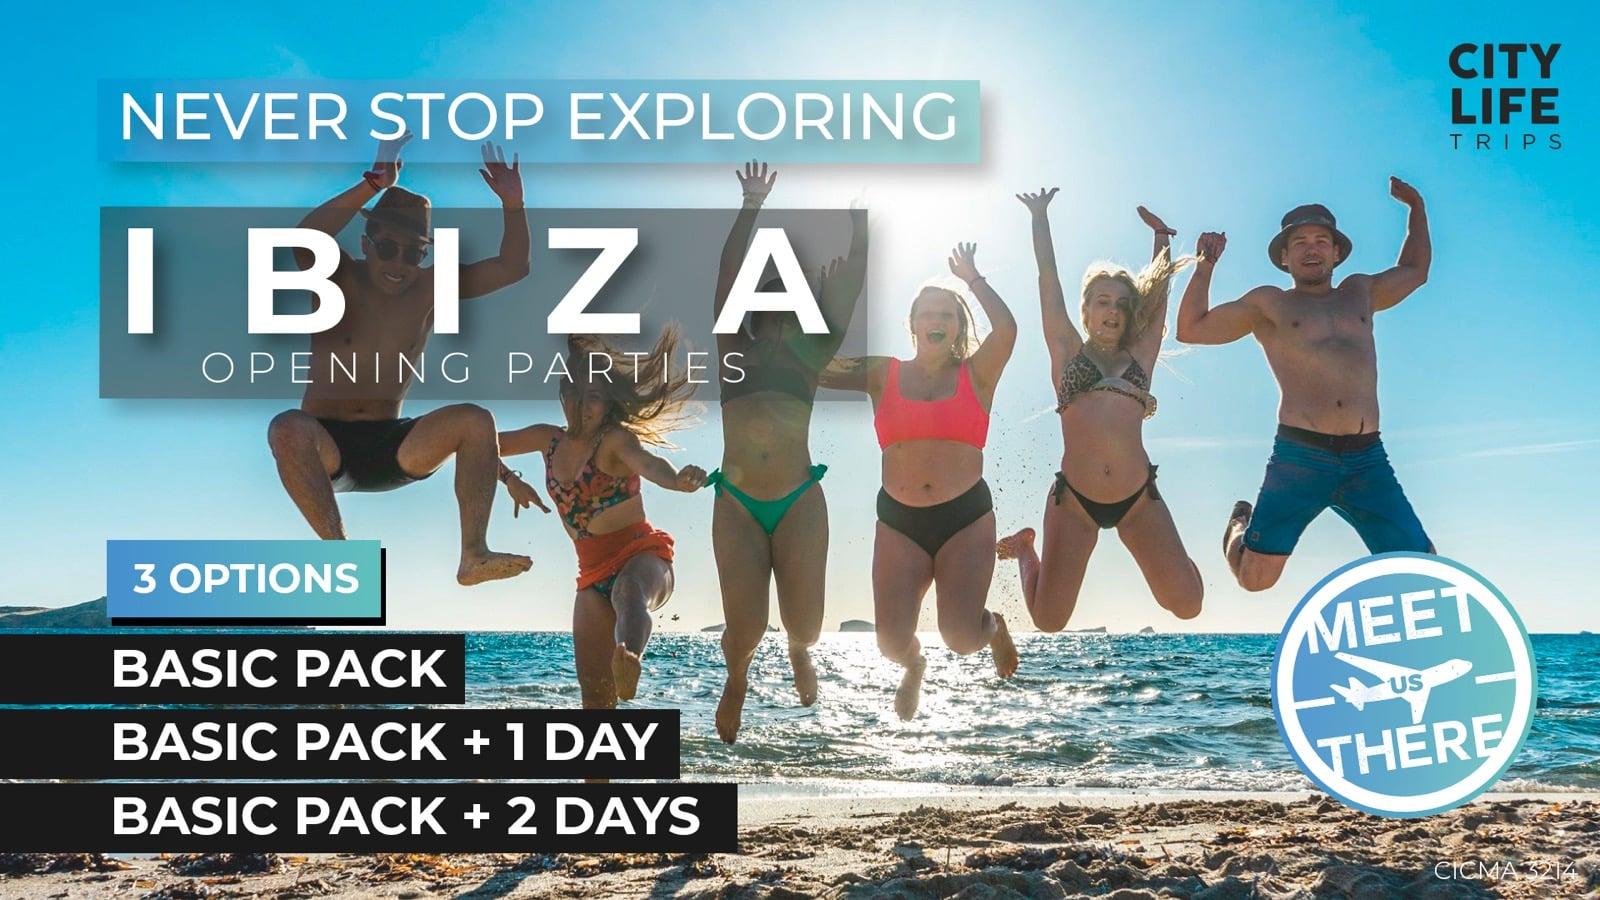 Ibiza - Opening Parties 2020